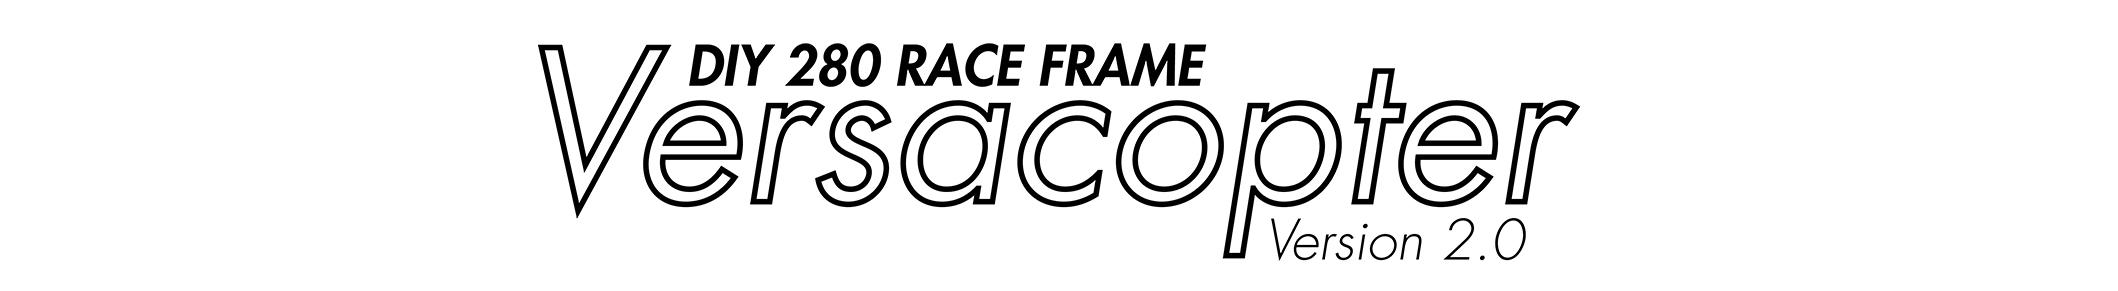 versabanner-logo.jpg